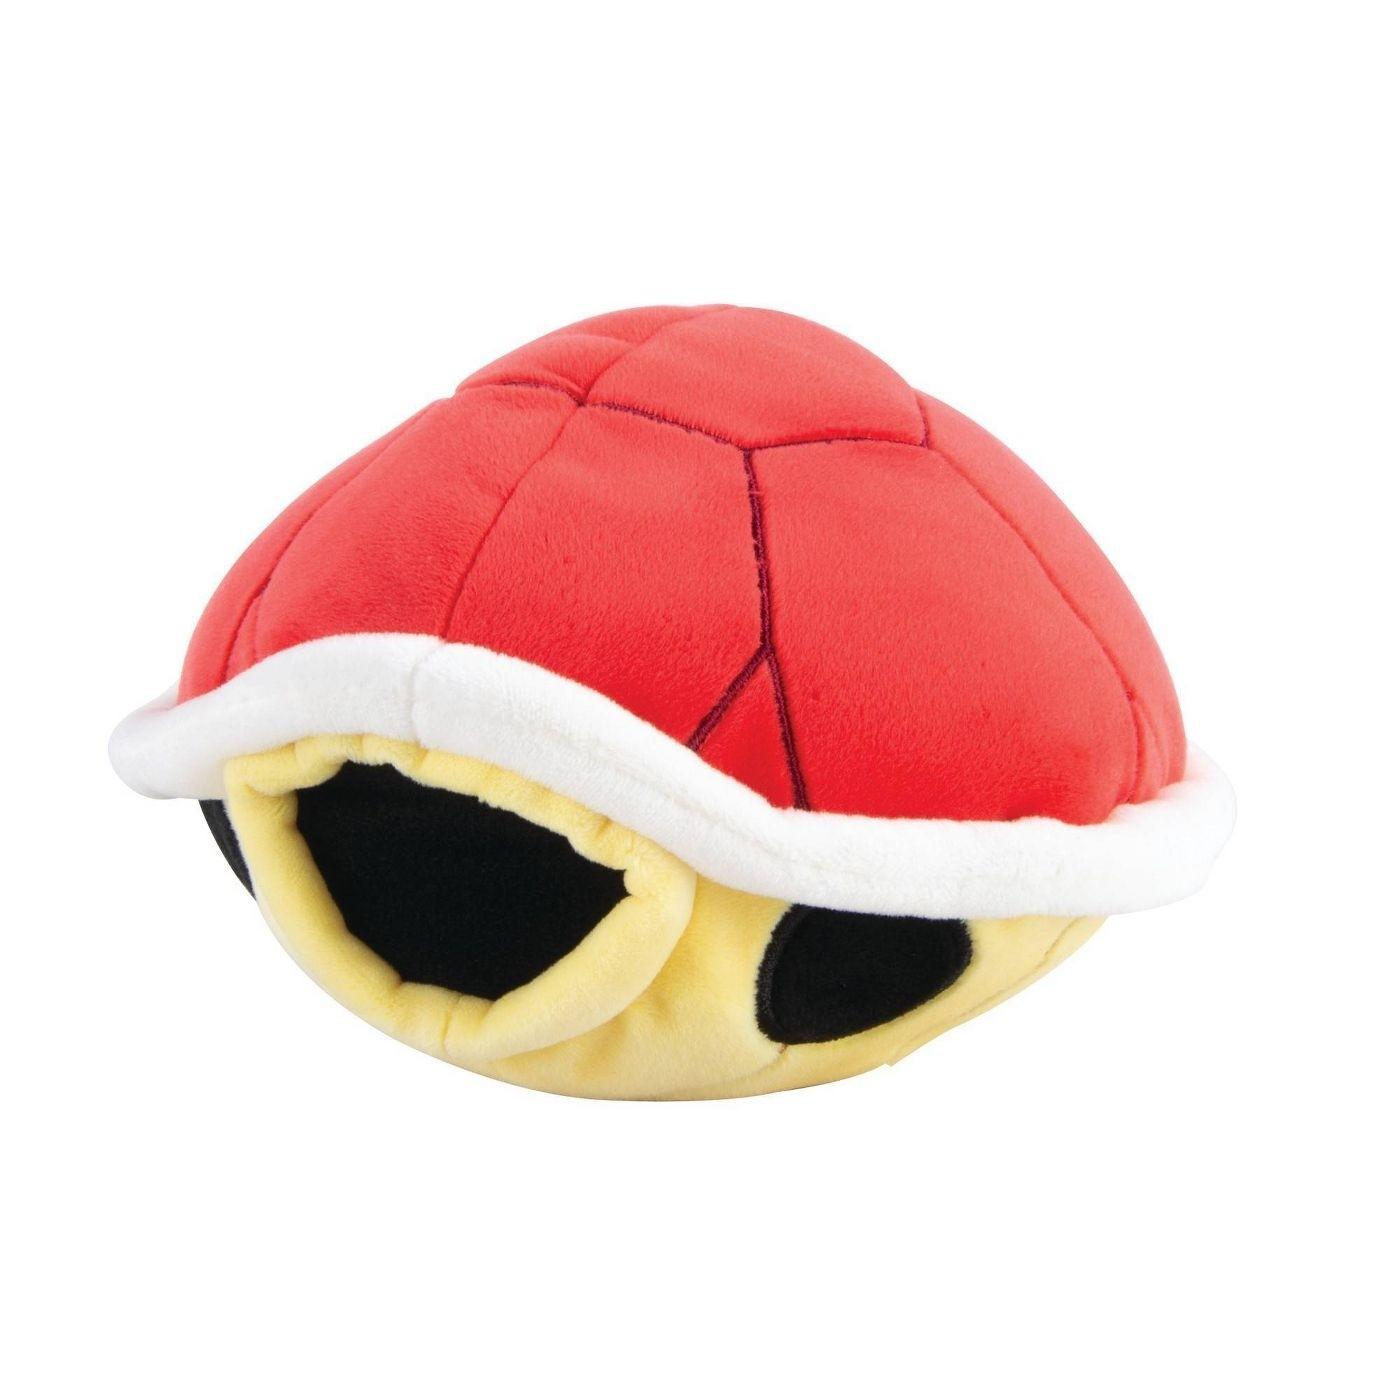 Mocchi-Mocchi Super Mario Red Shell (Junior)